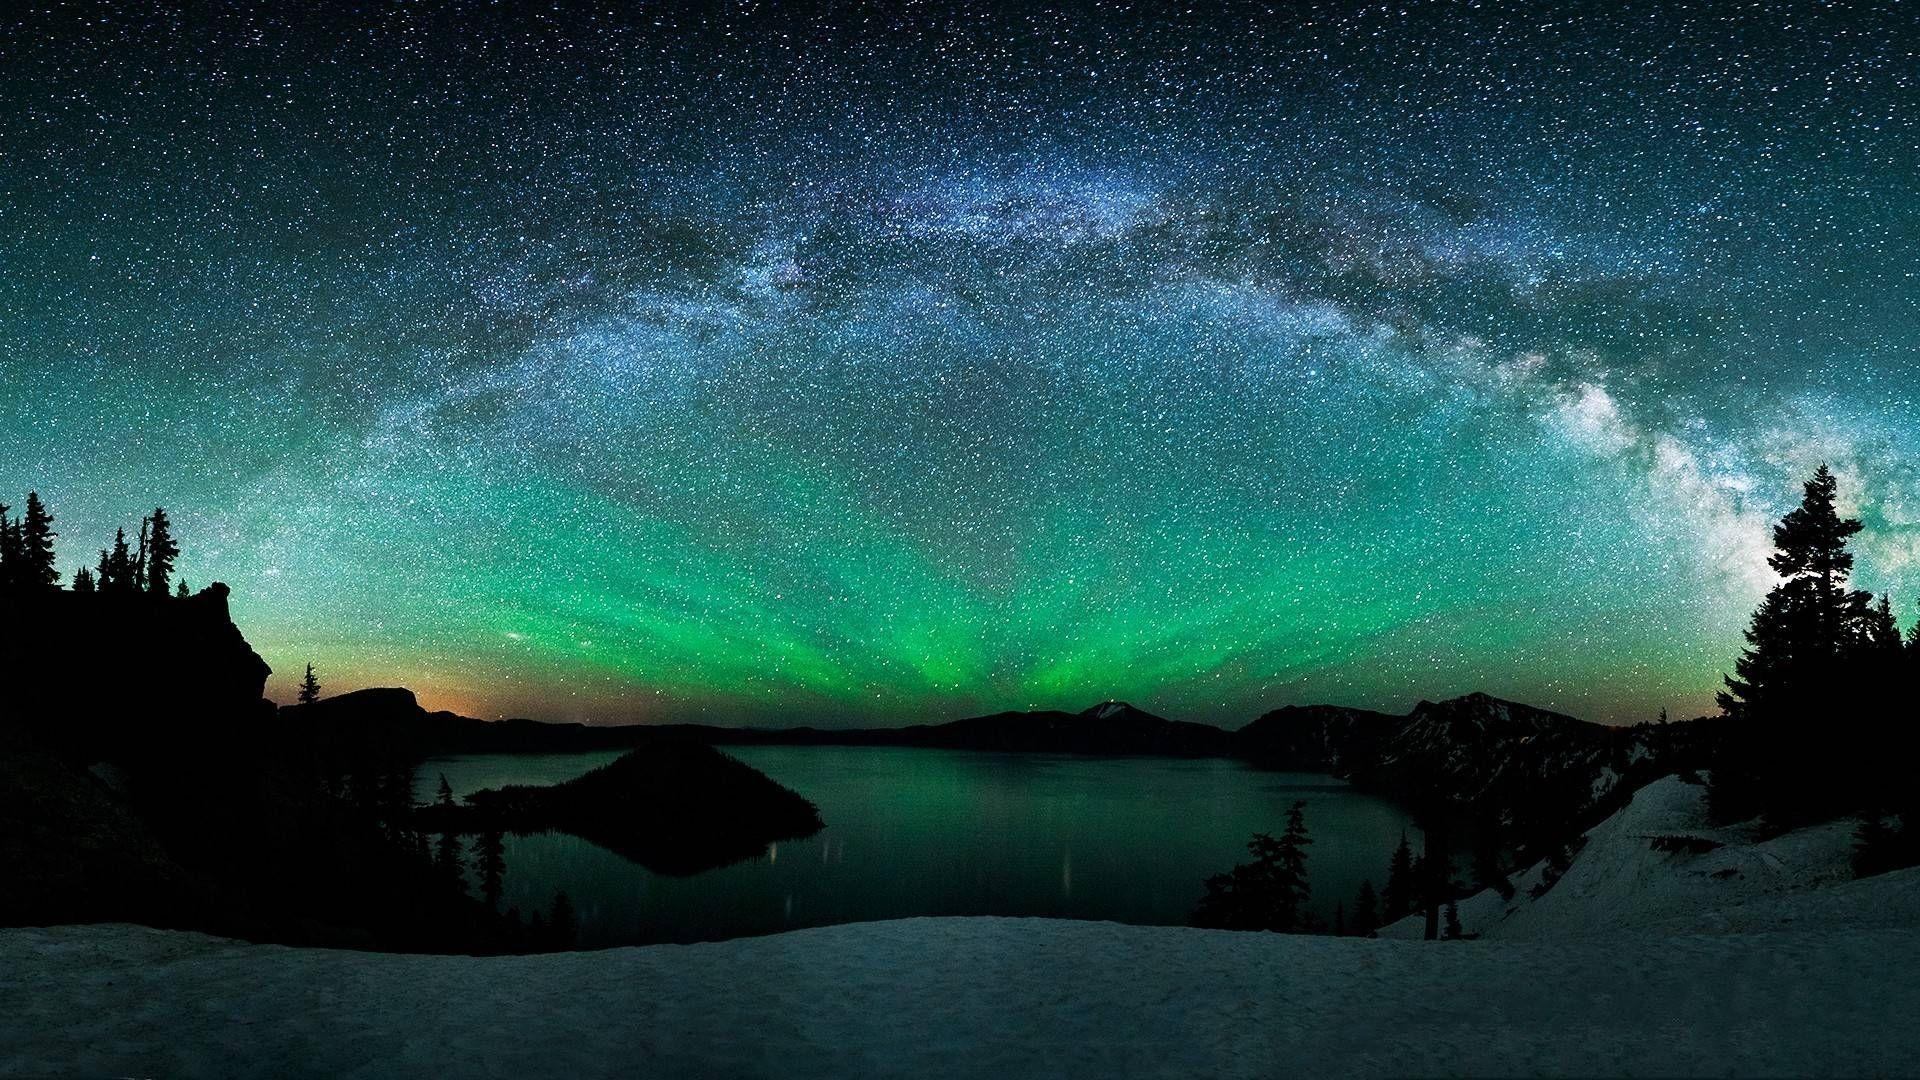 Real aurora borealis nature wallpaper x